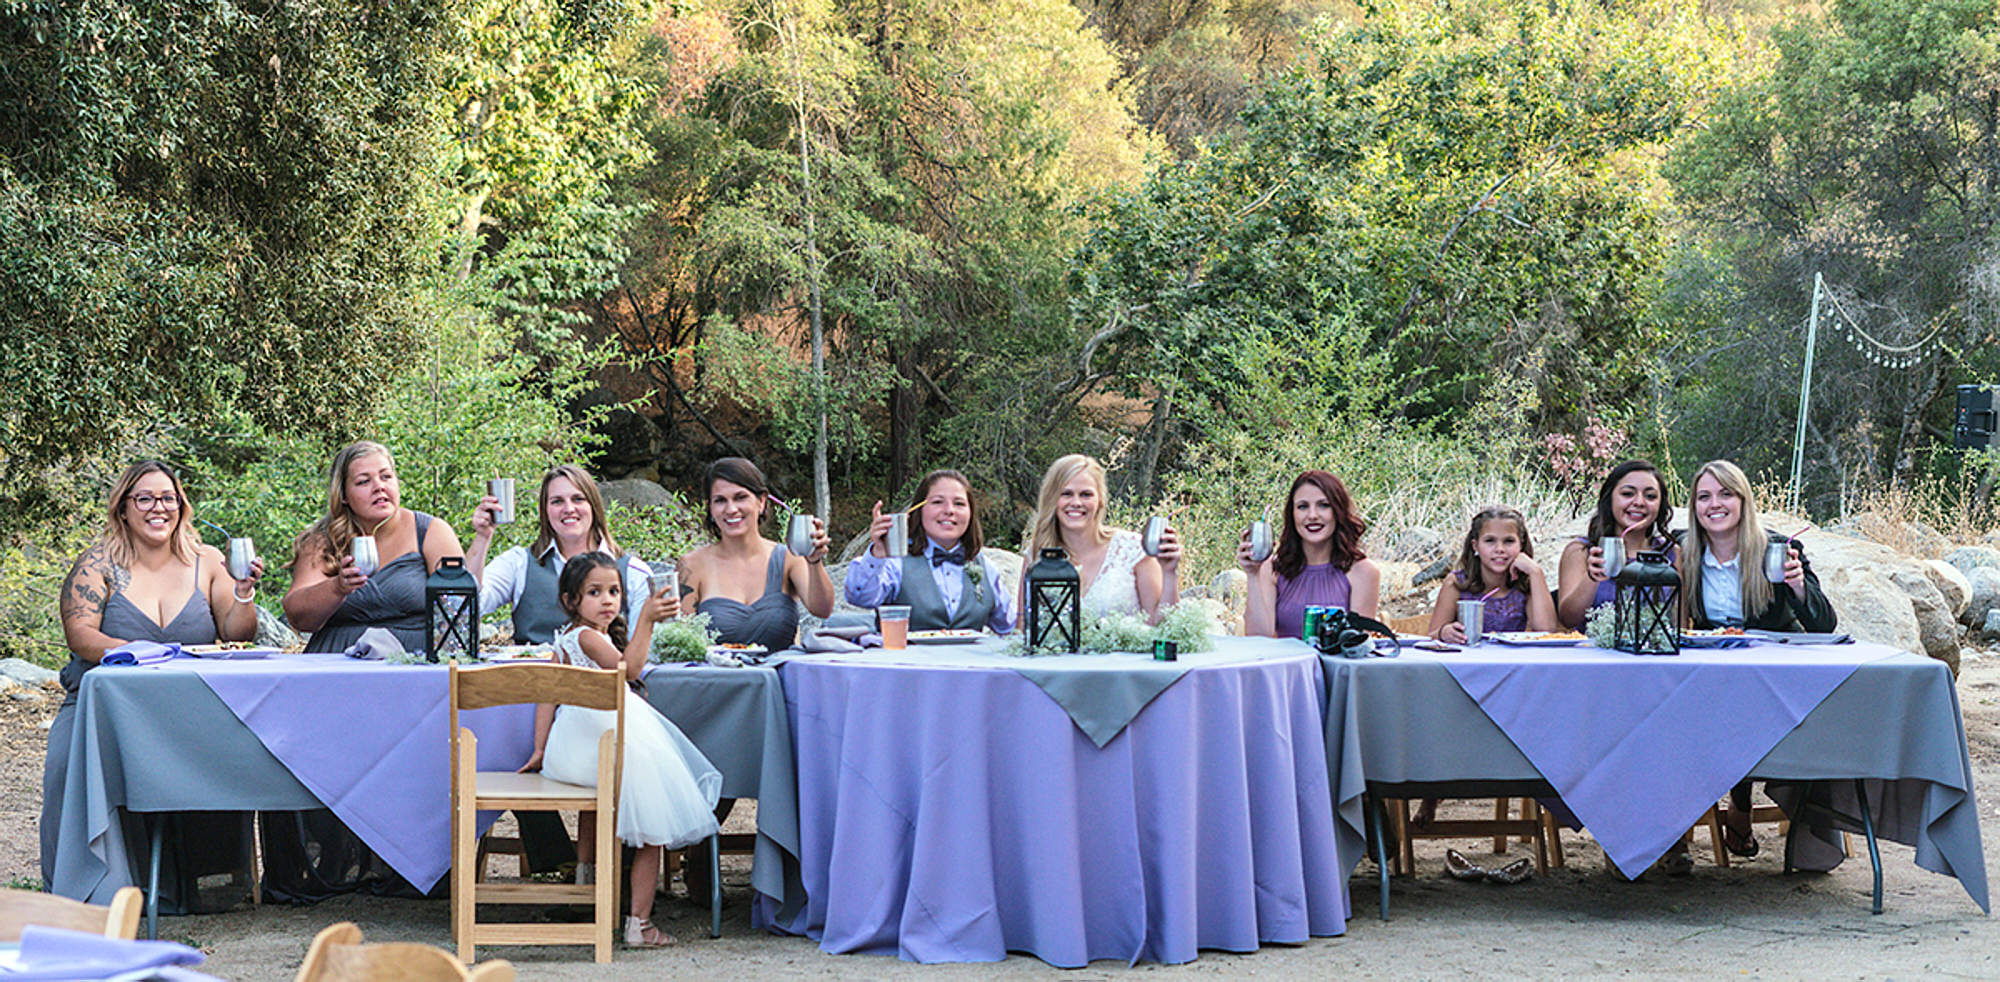 Redwood-Ranch-Three-Rivers-CA-Wedding-Venue-035.jpg